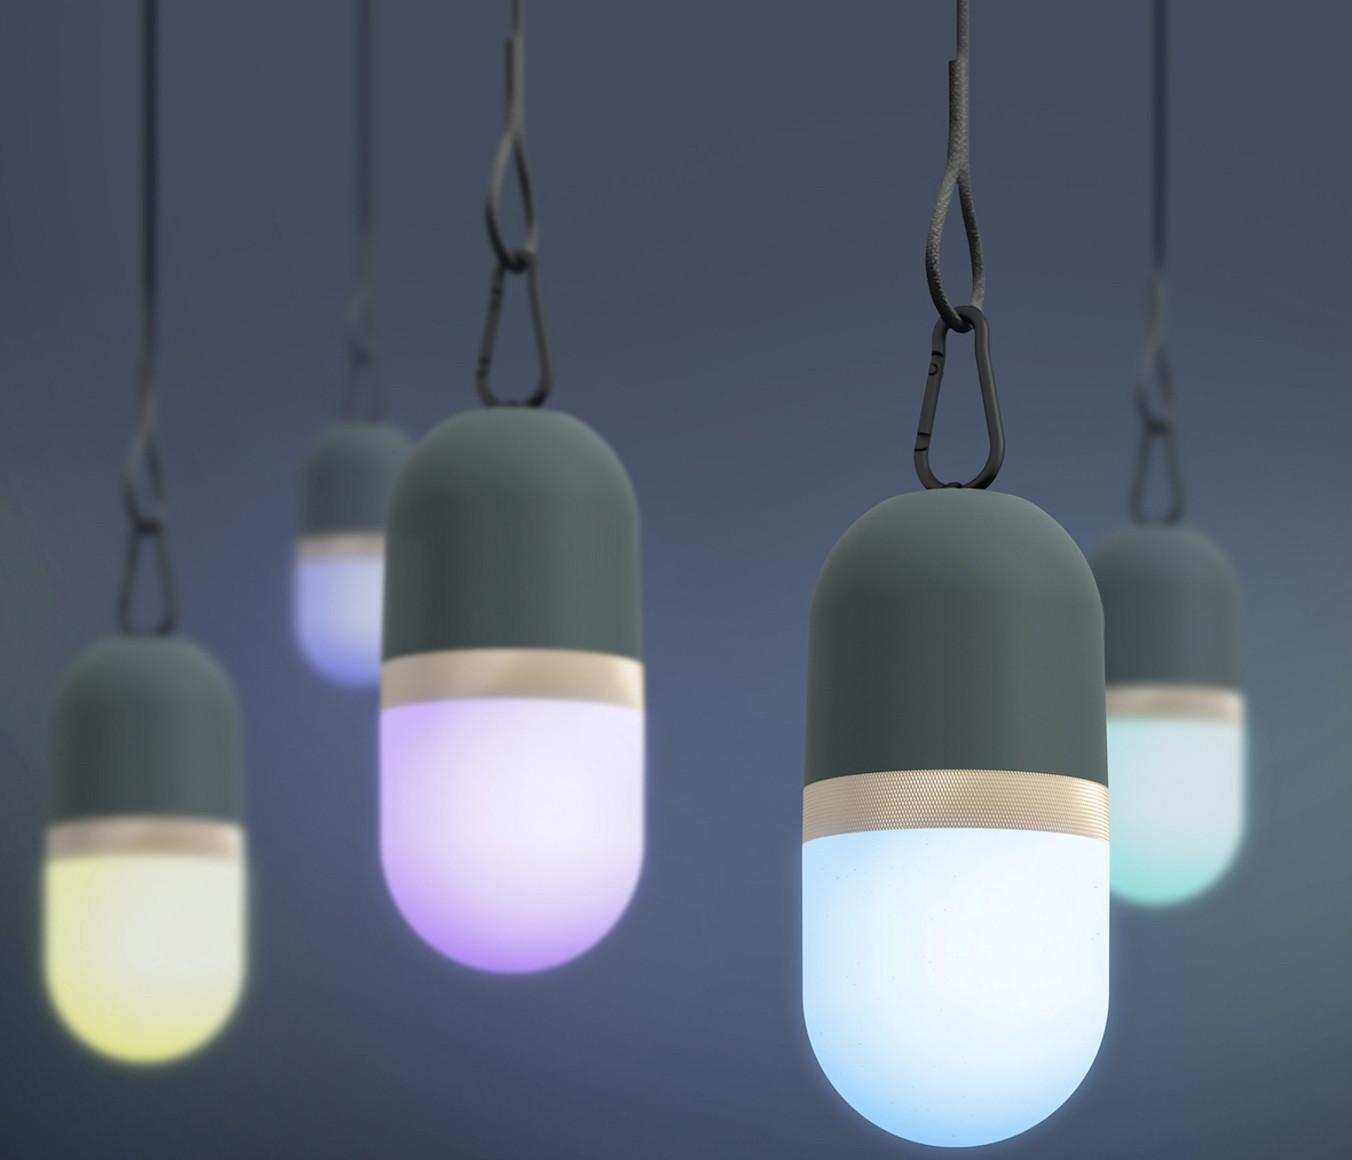 Entdecken Sie die kabellose Lucis 3.0 LED Lampe hier